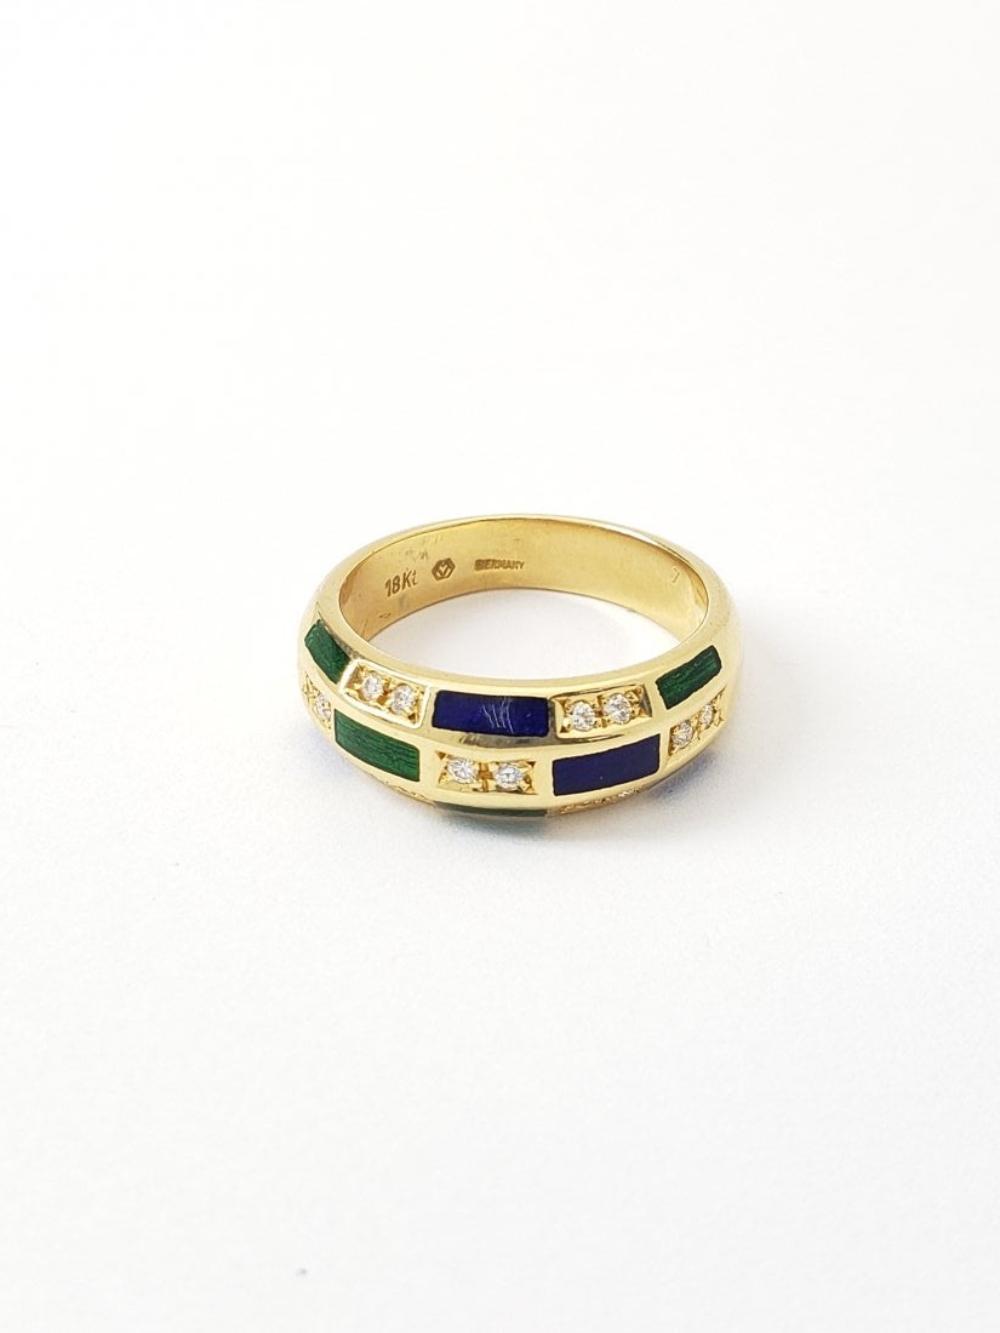 Lot 188: Womens Designer Faberge 18k Gold Diamond Enamel Sz 7 Ring